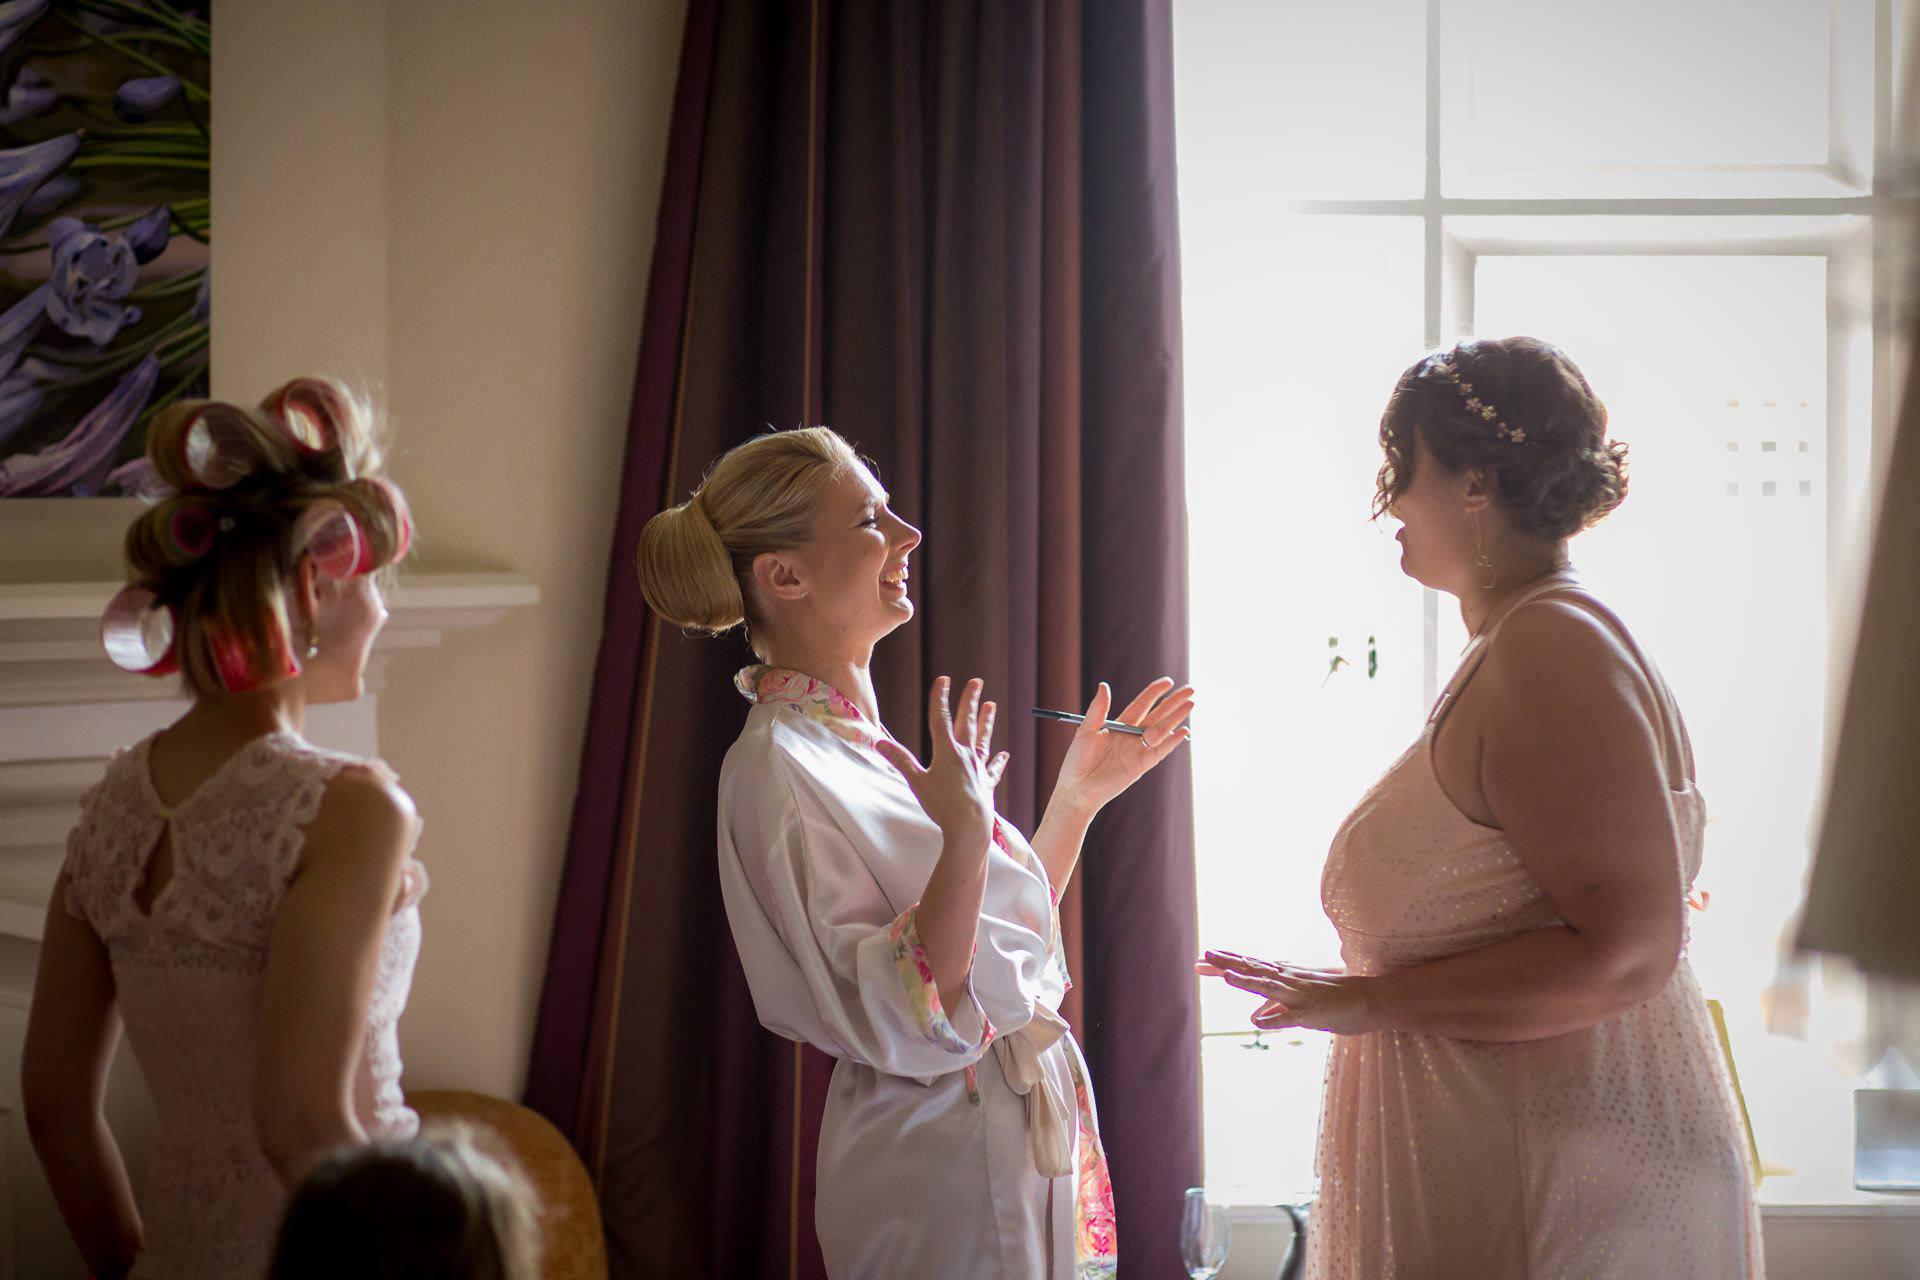 Wotton House wedding bride happy talking to her friend